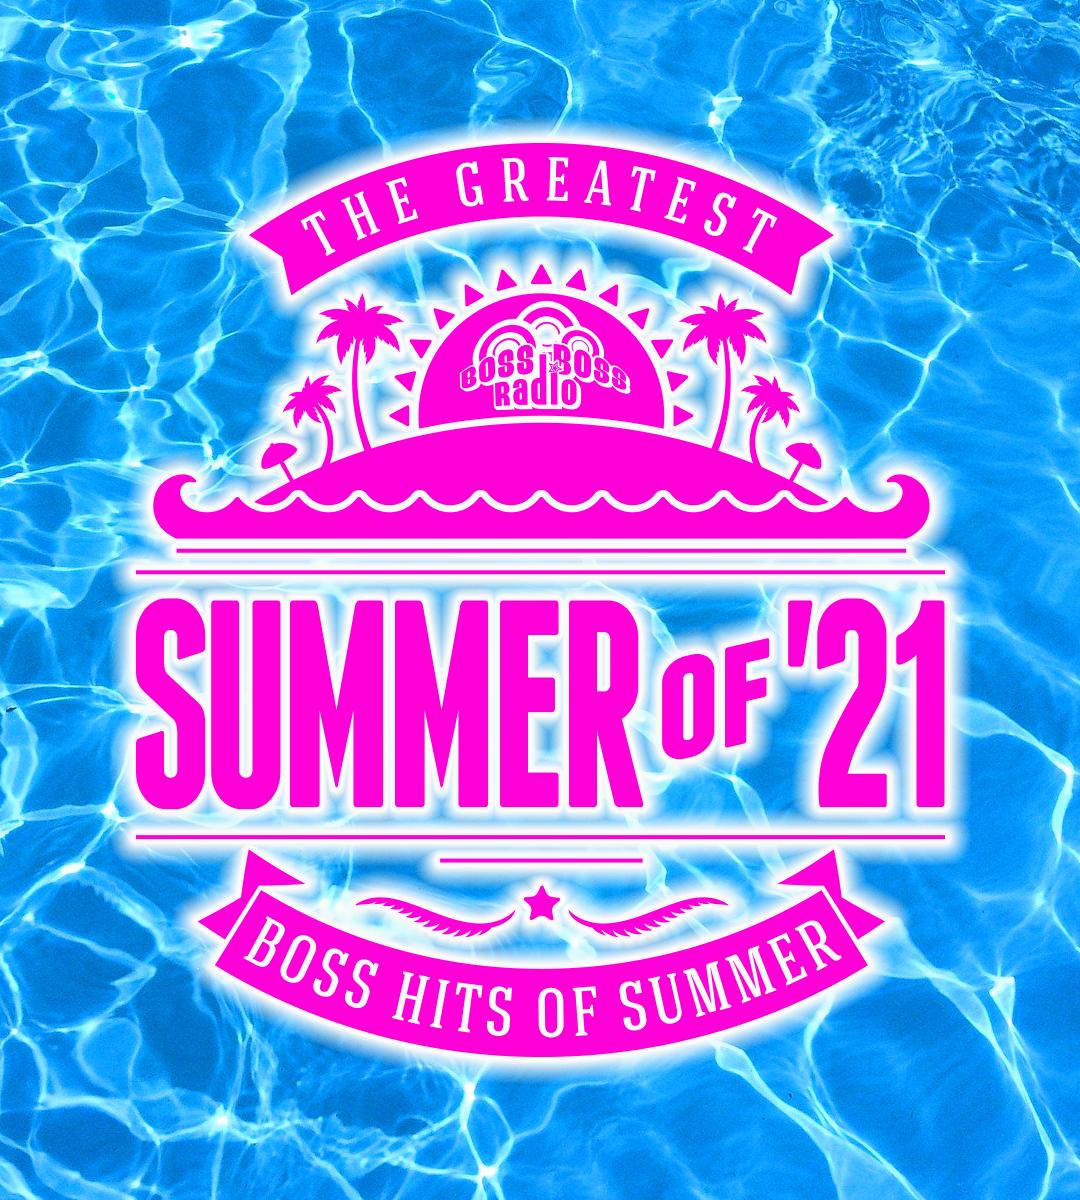 Summer-of-21-Logo-Port-Pool